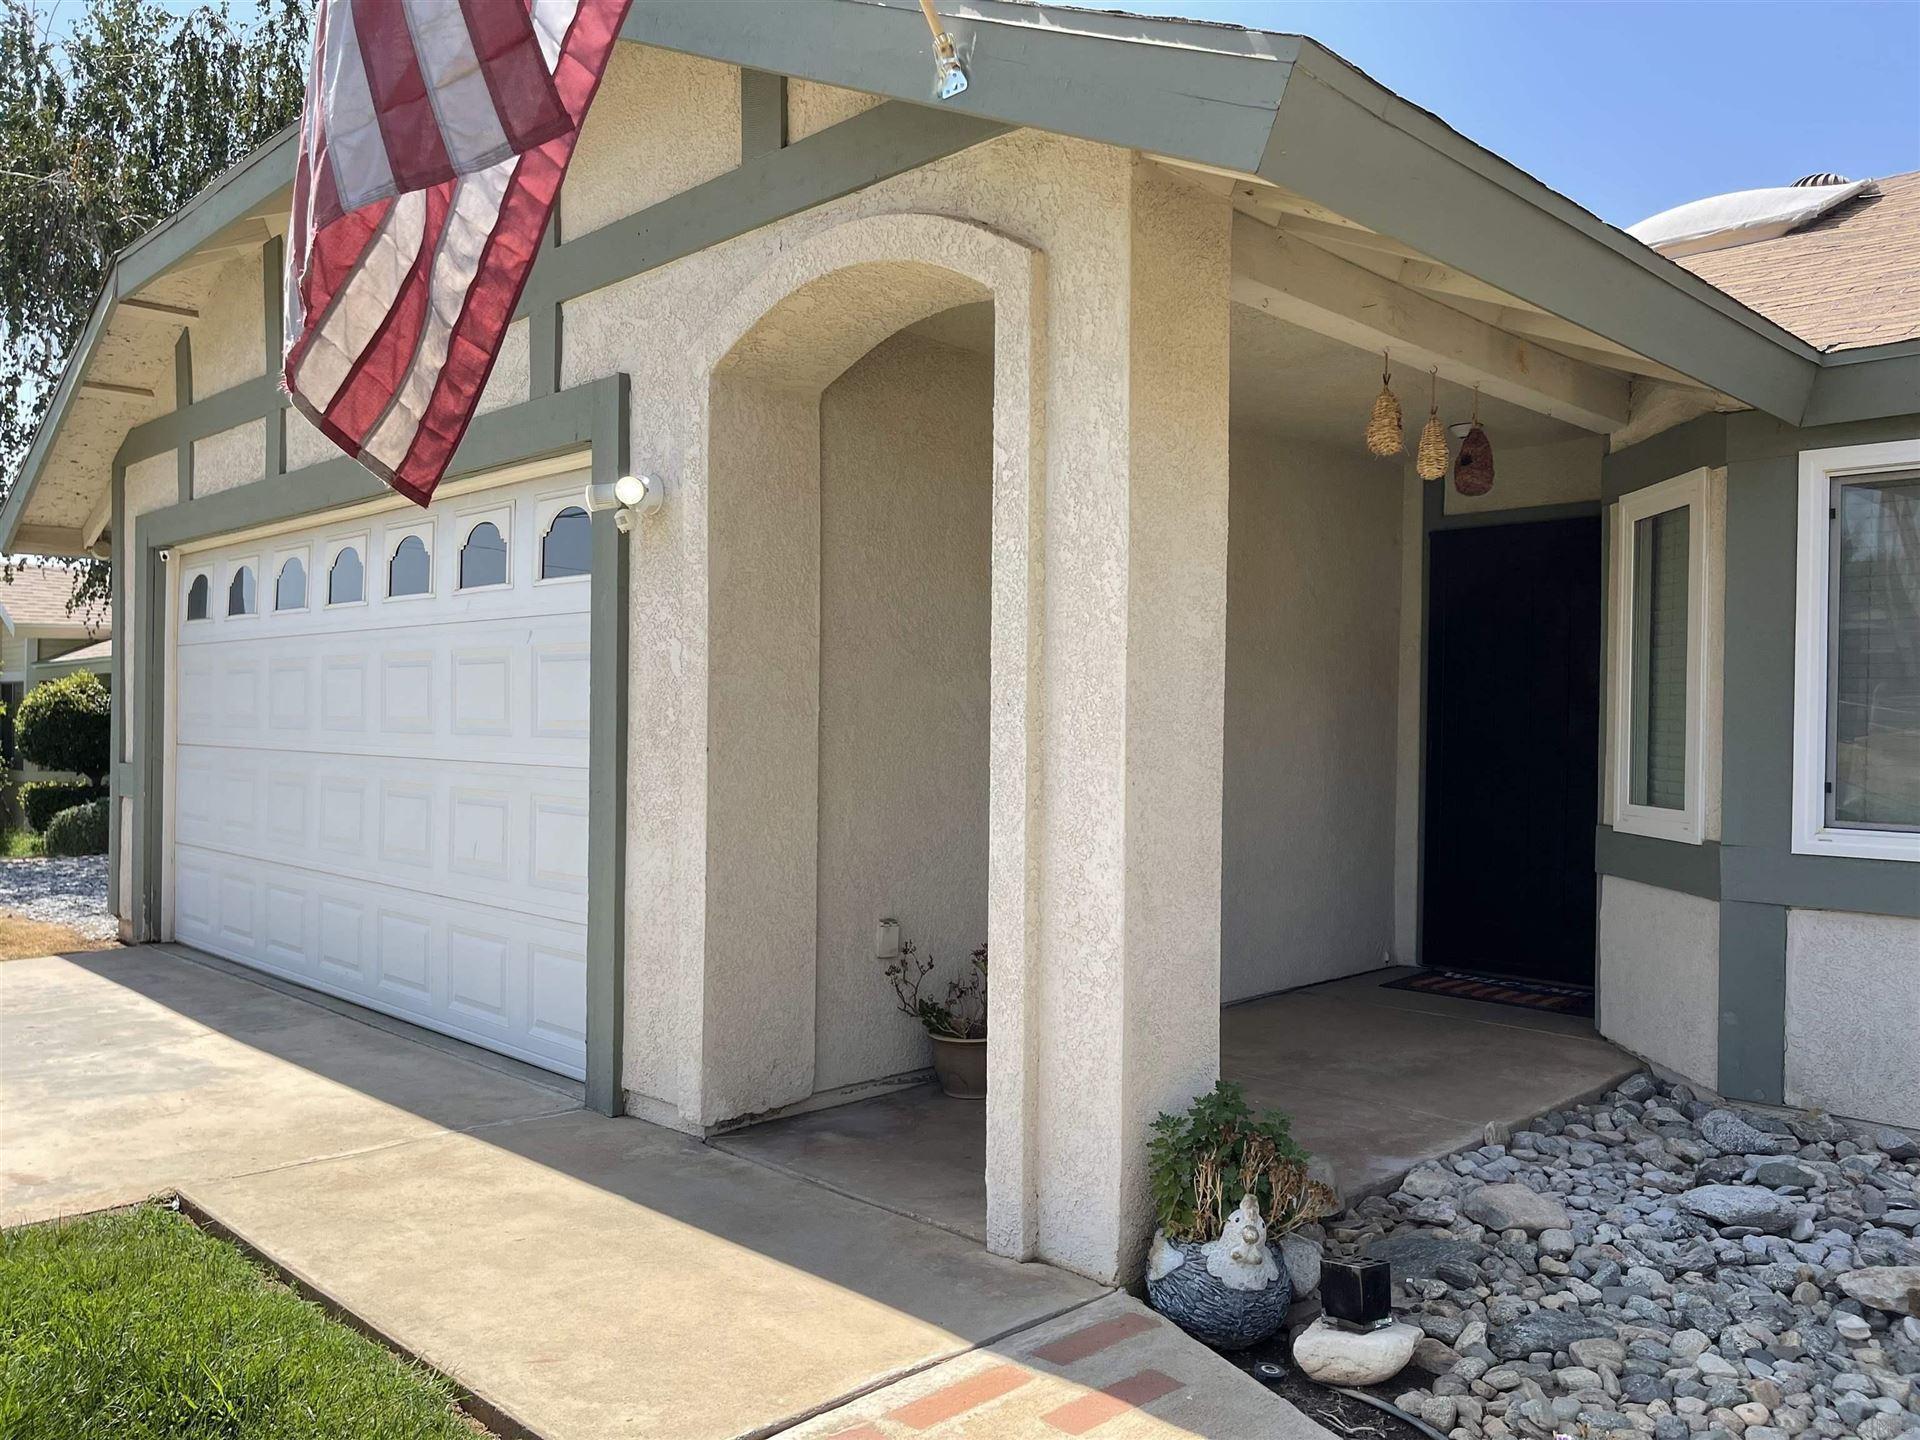 Photo of 34910 Buena Mesa Dr, Calimesa, CA 92320 (MLS # 210026818)